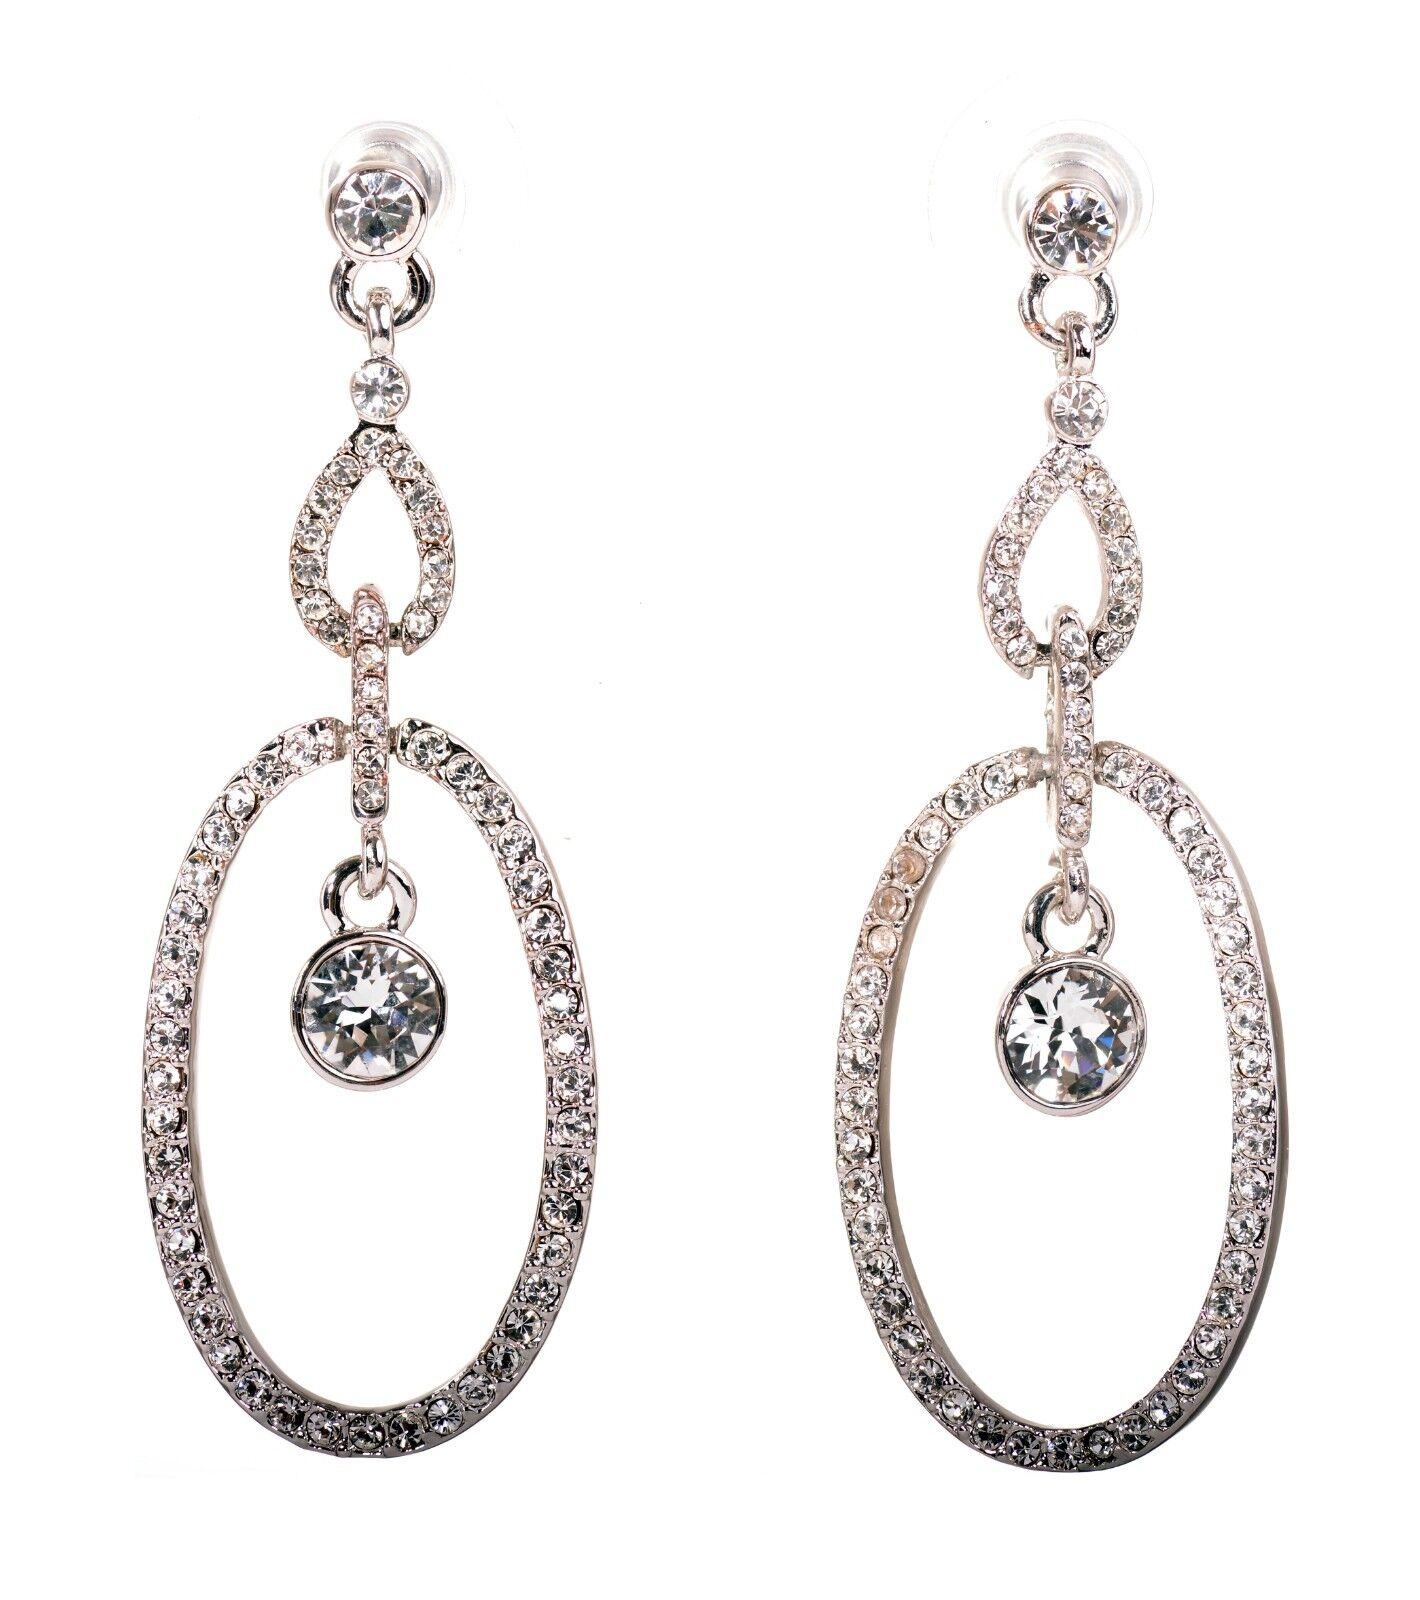 Swarovski Elements Crystal Oval Loops Pierced Earrings Rhodium Authentic 7330z